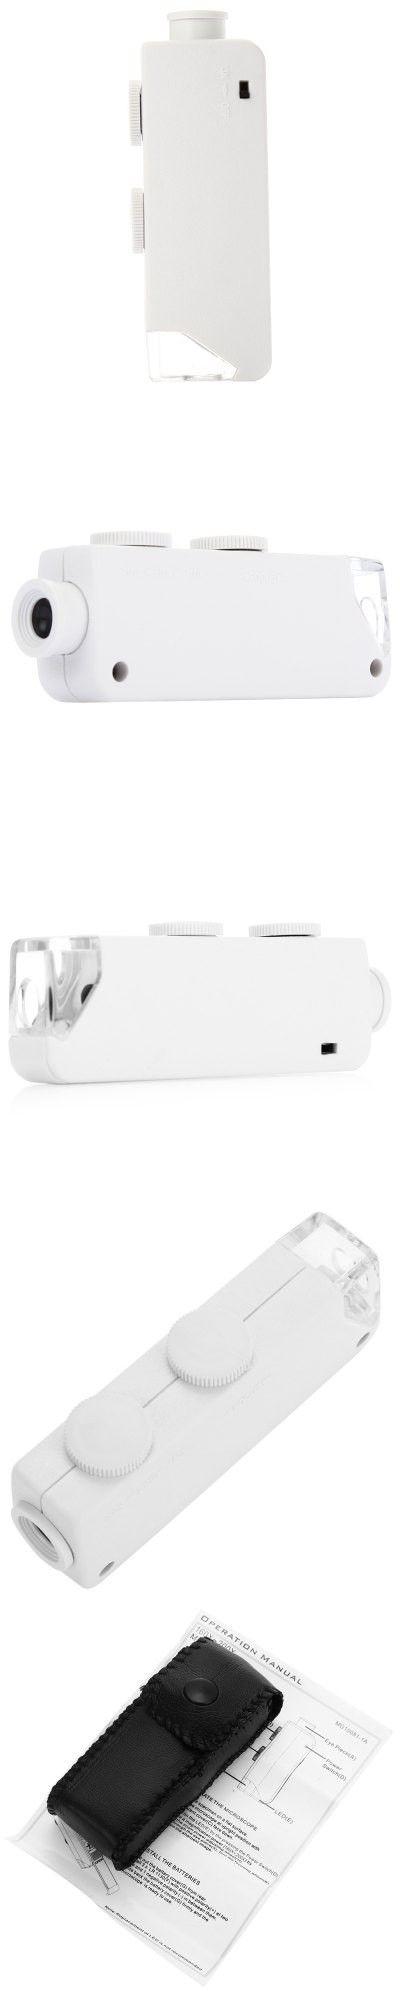 Mini 160x - 200x Zoom Lens Pocket Microscope with LED Light